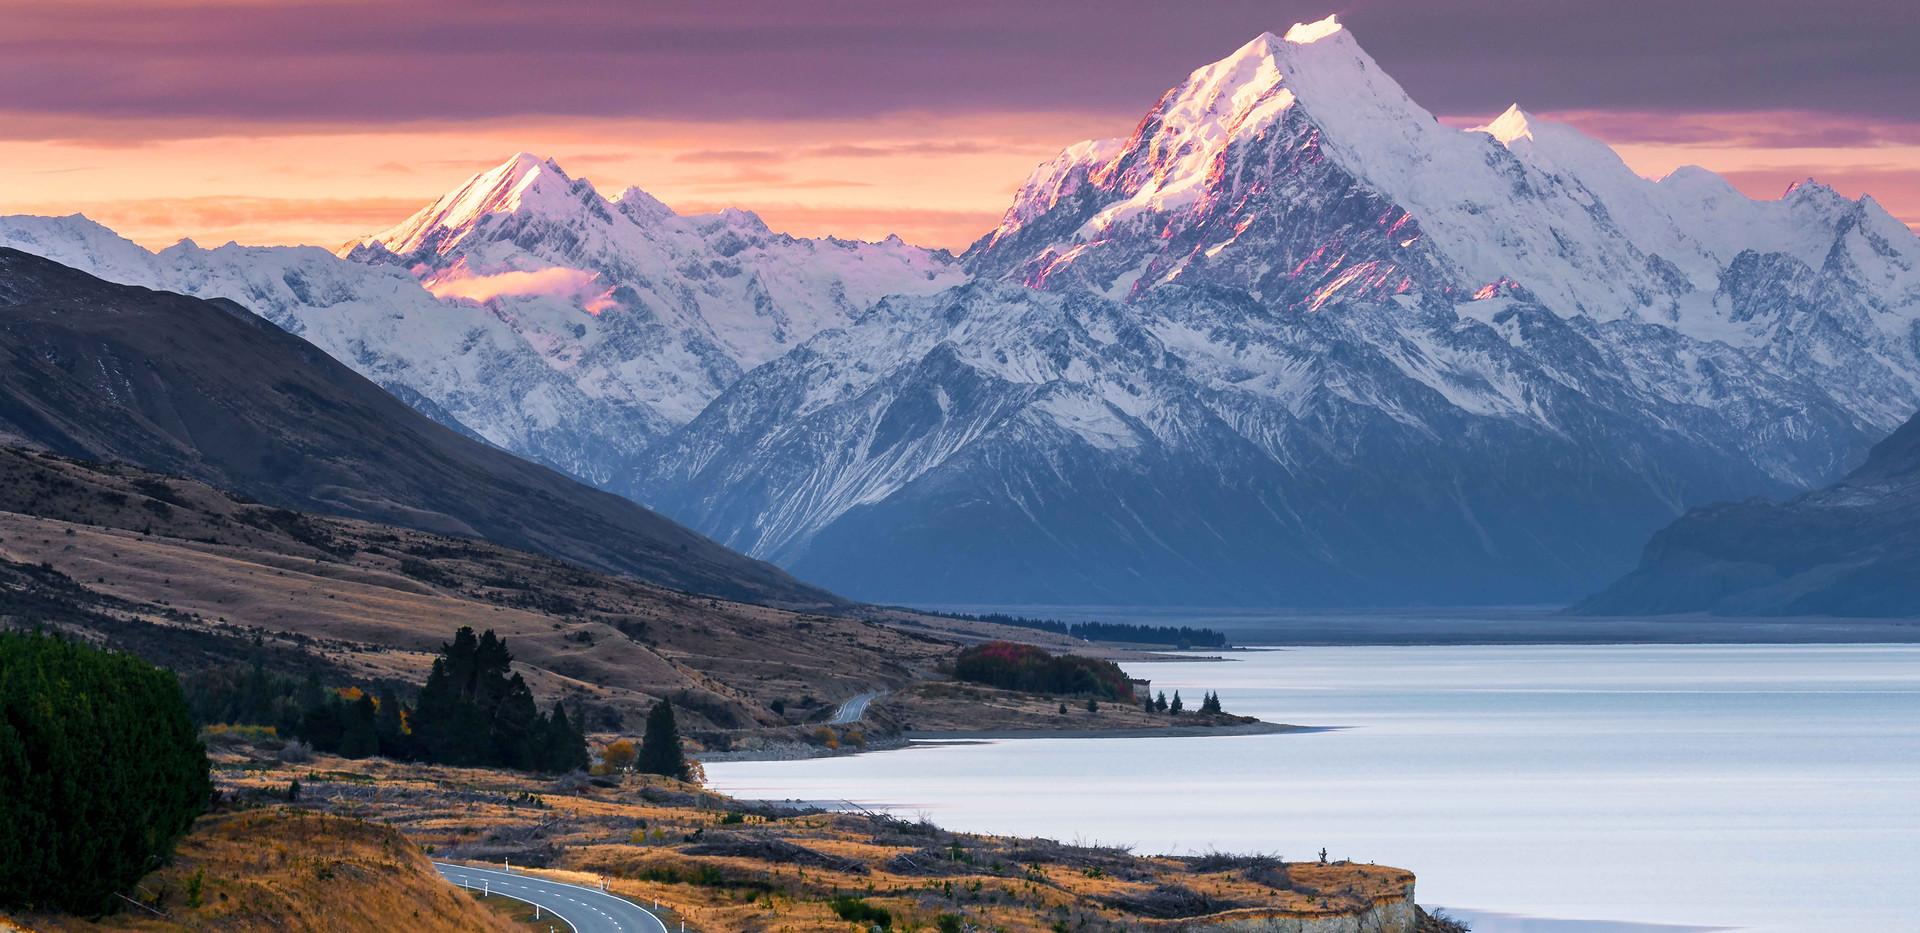 The Road to Mount Cook, Lake Pukaki